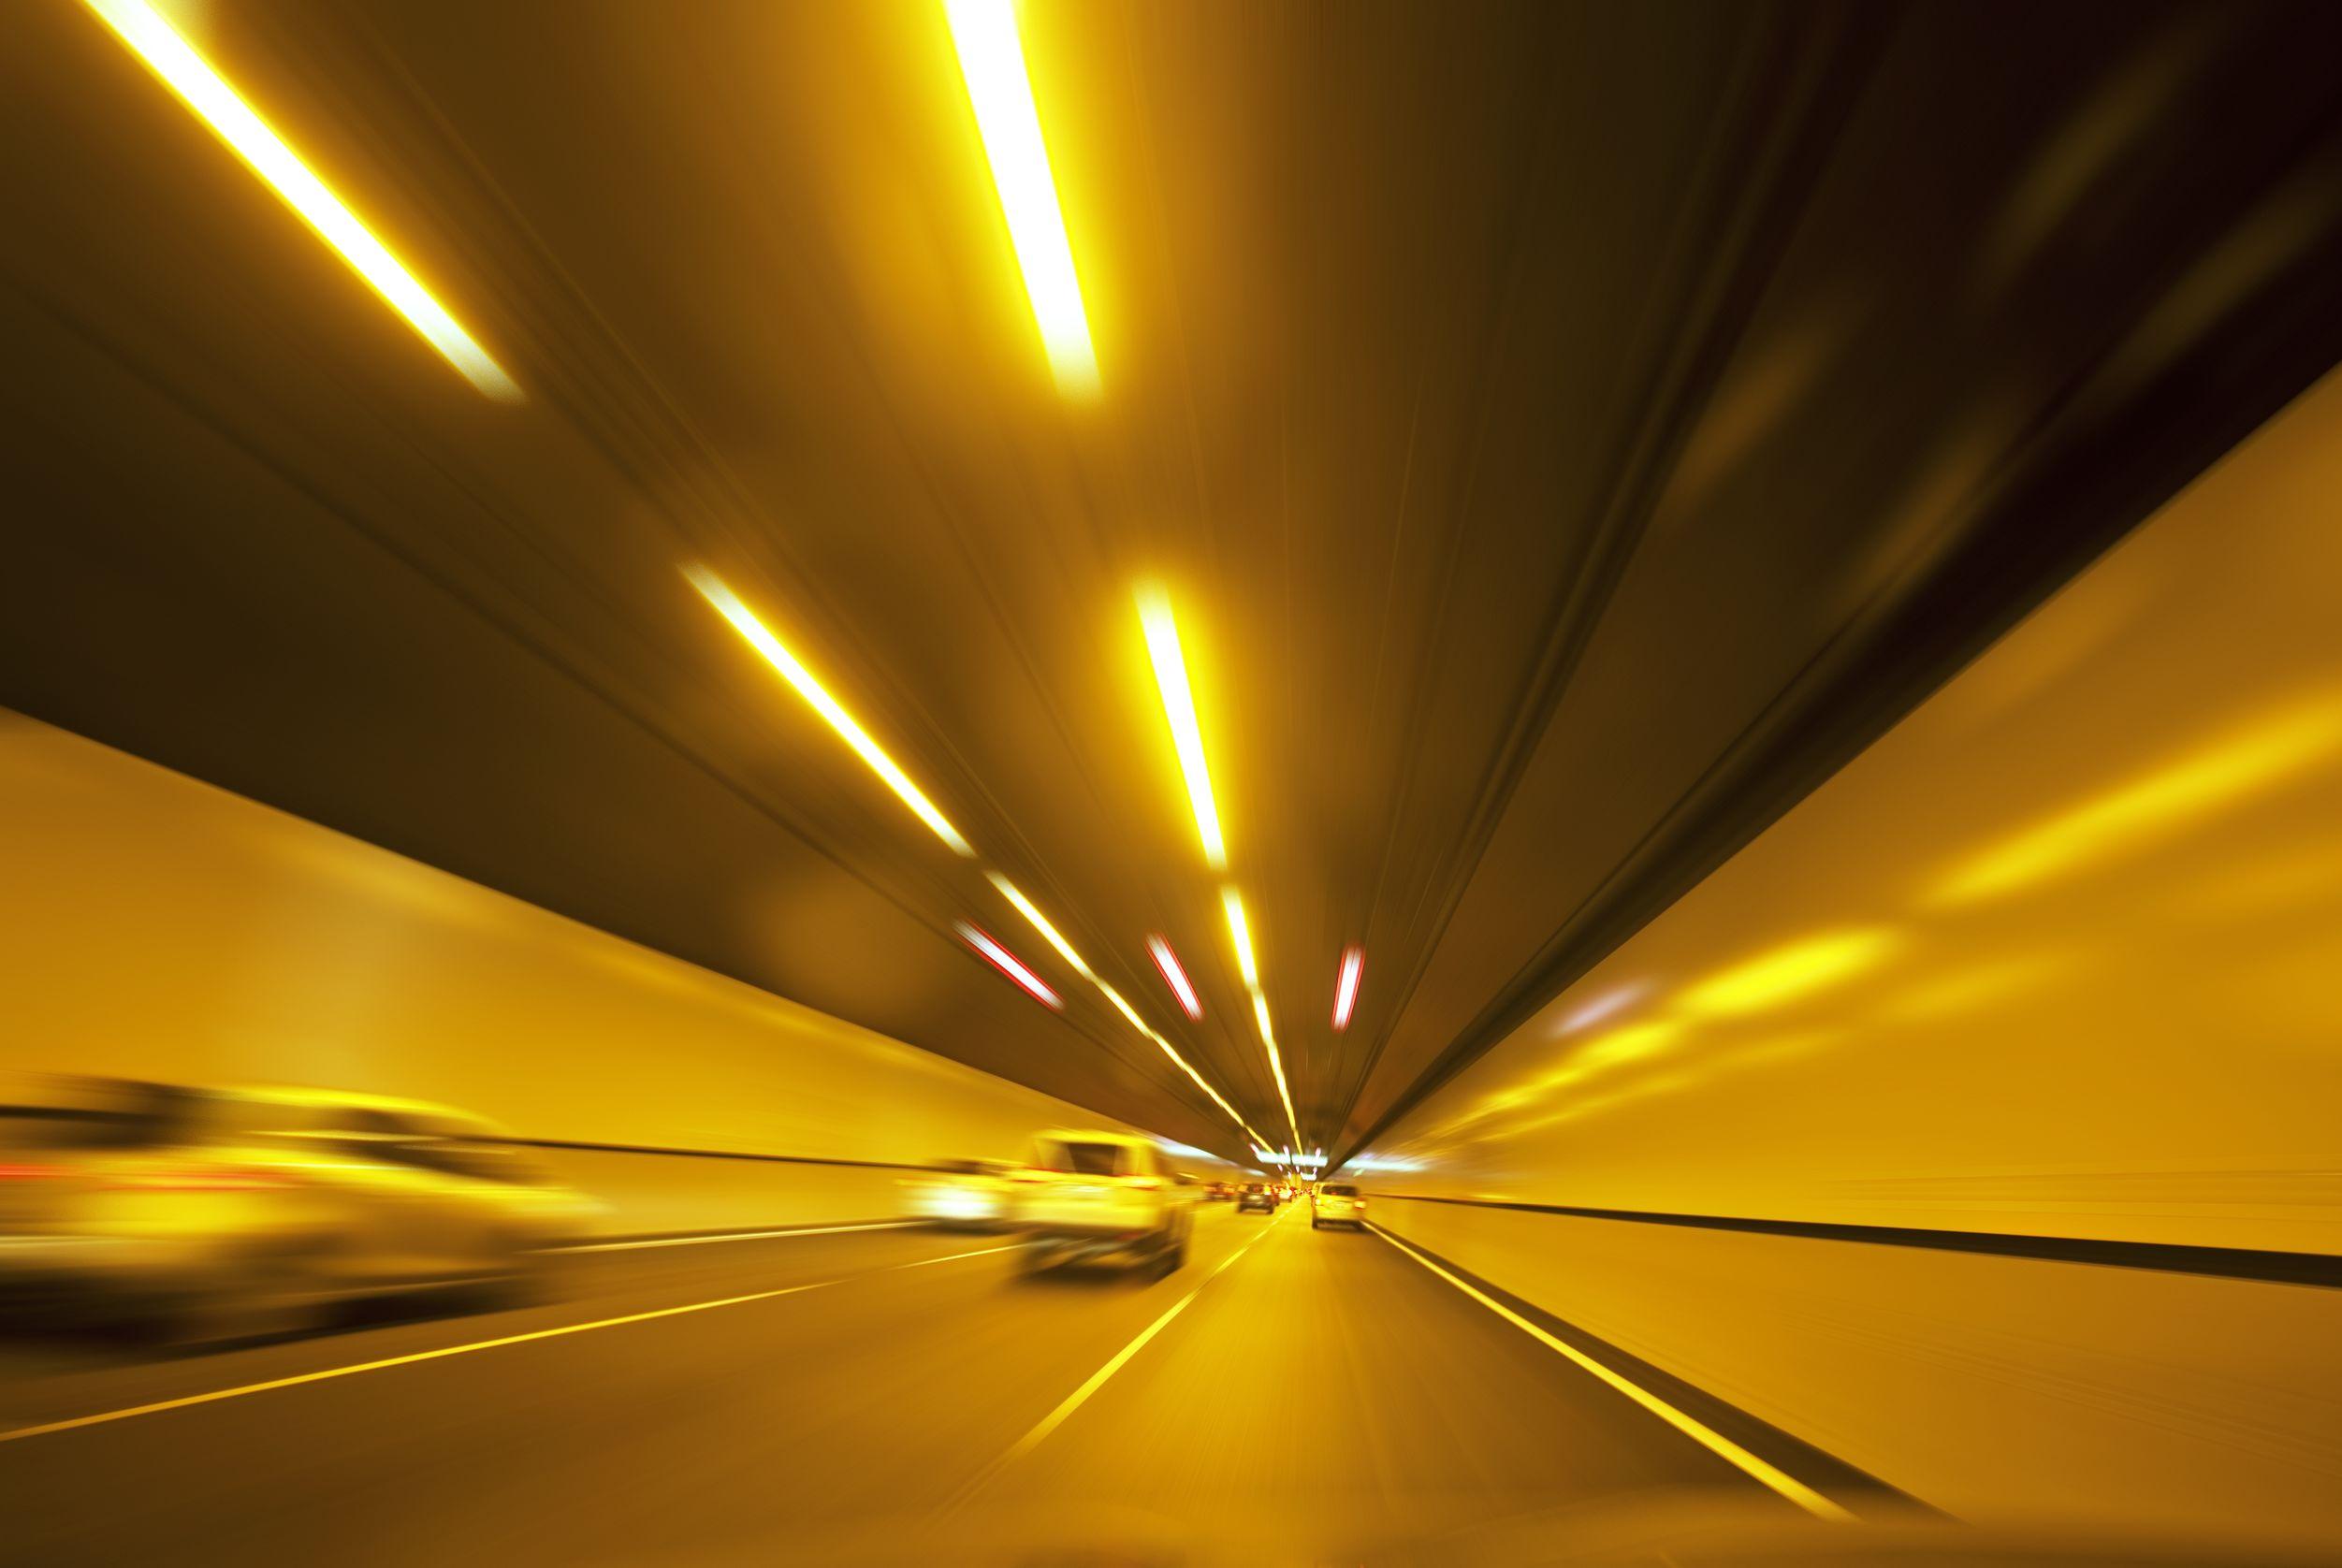 tunnel lights light orange why eyes zone lighting torque tunnels